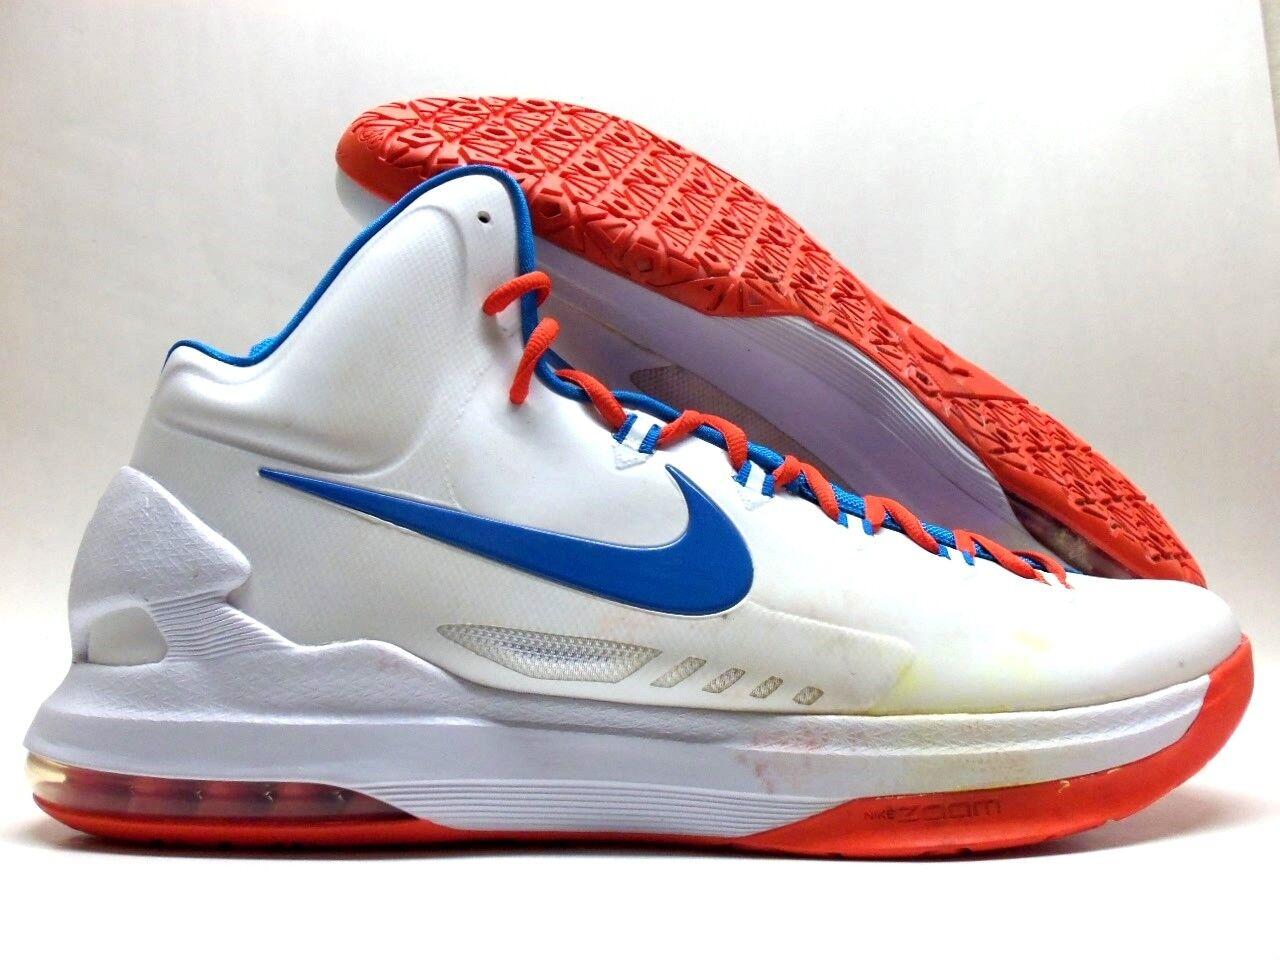 Nike zoom bianco kd / kevin durant bianco zoom / foto blue-orange dimensioni uomini 17 [554988-100] 7122ee